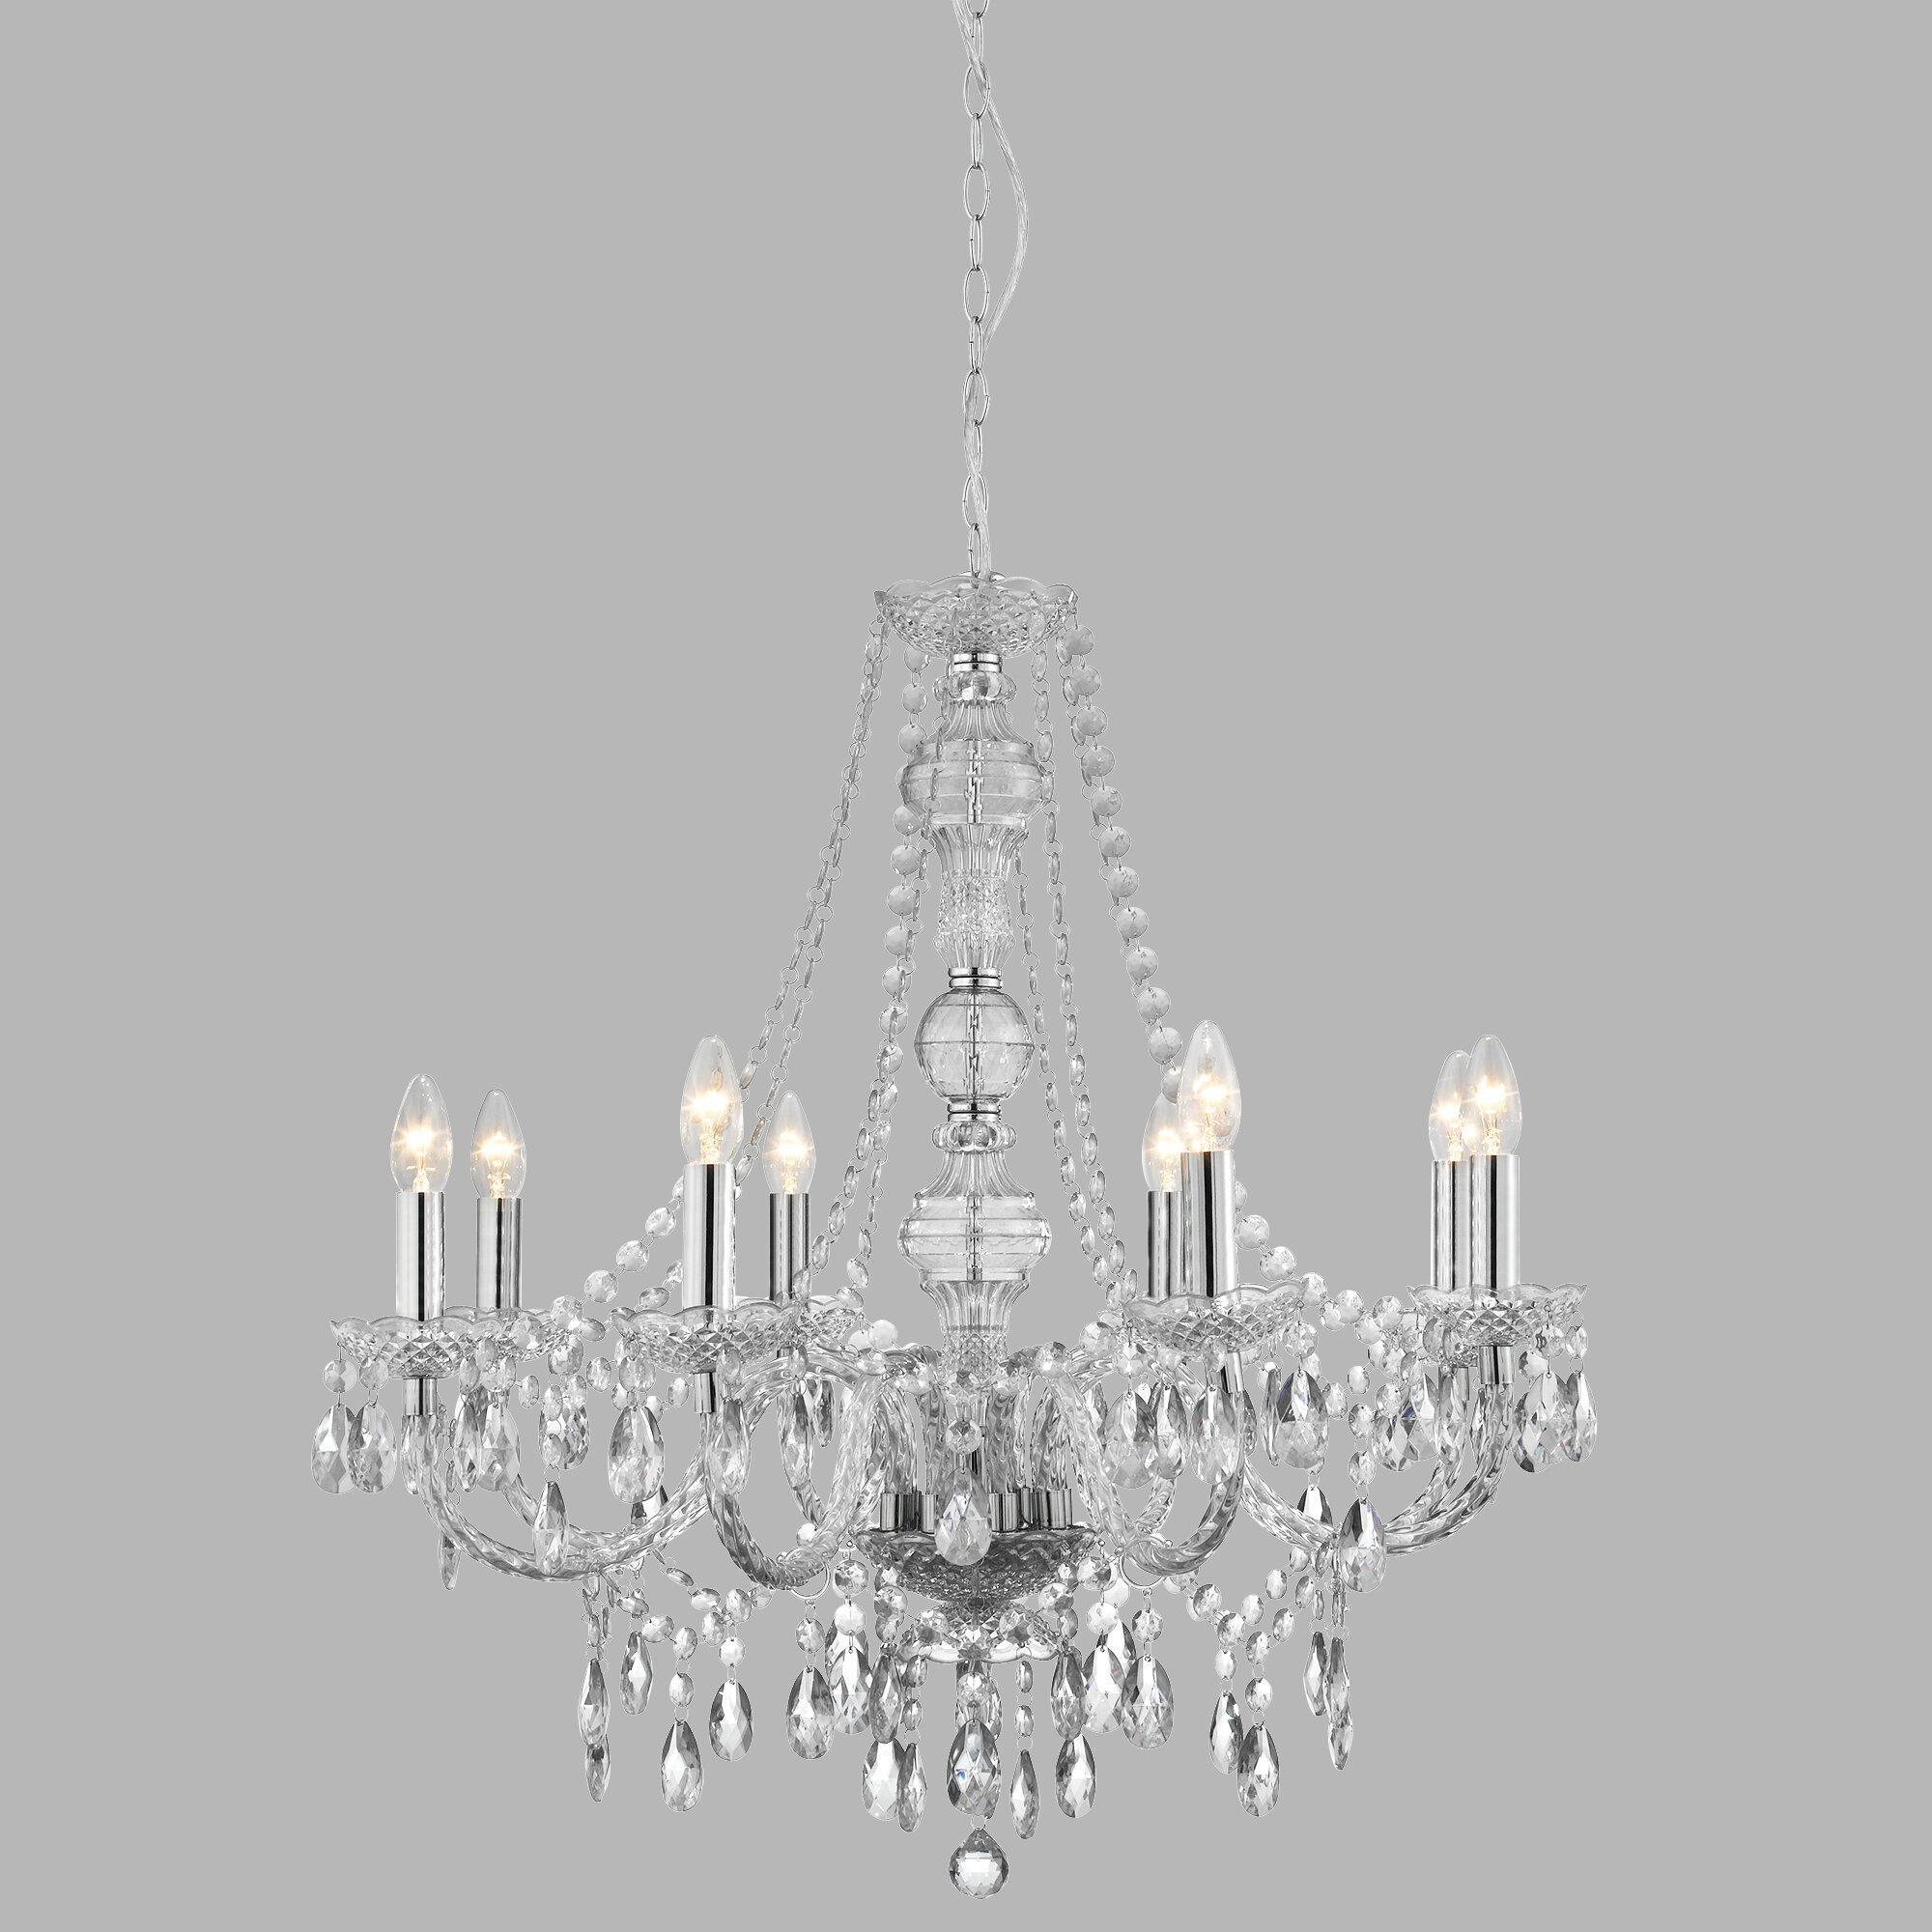 Aurelio 8-Light Candle-Style Chandelier